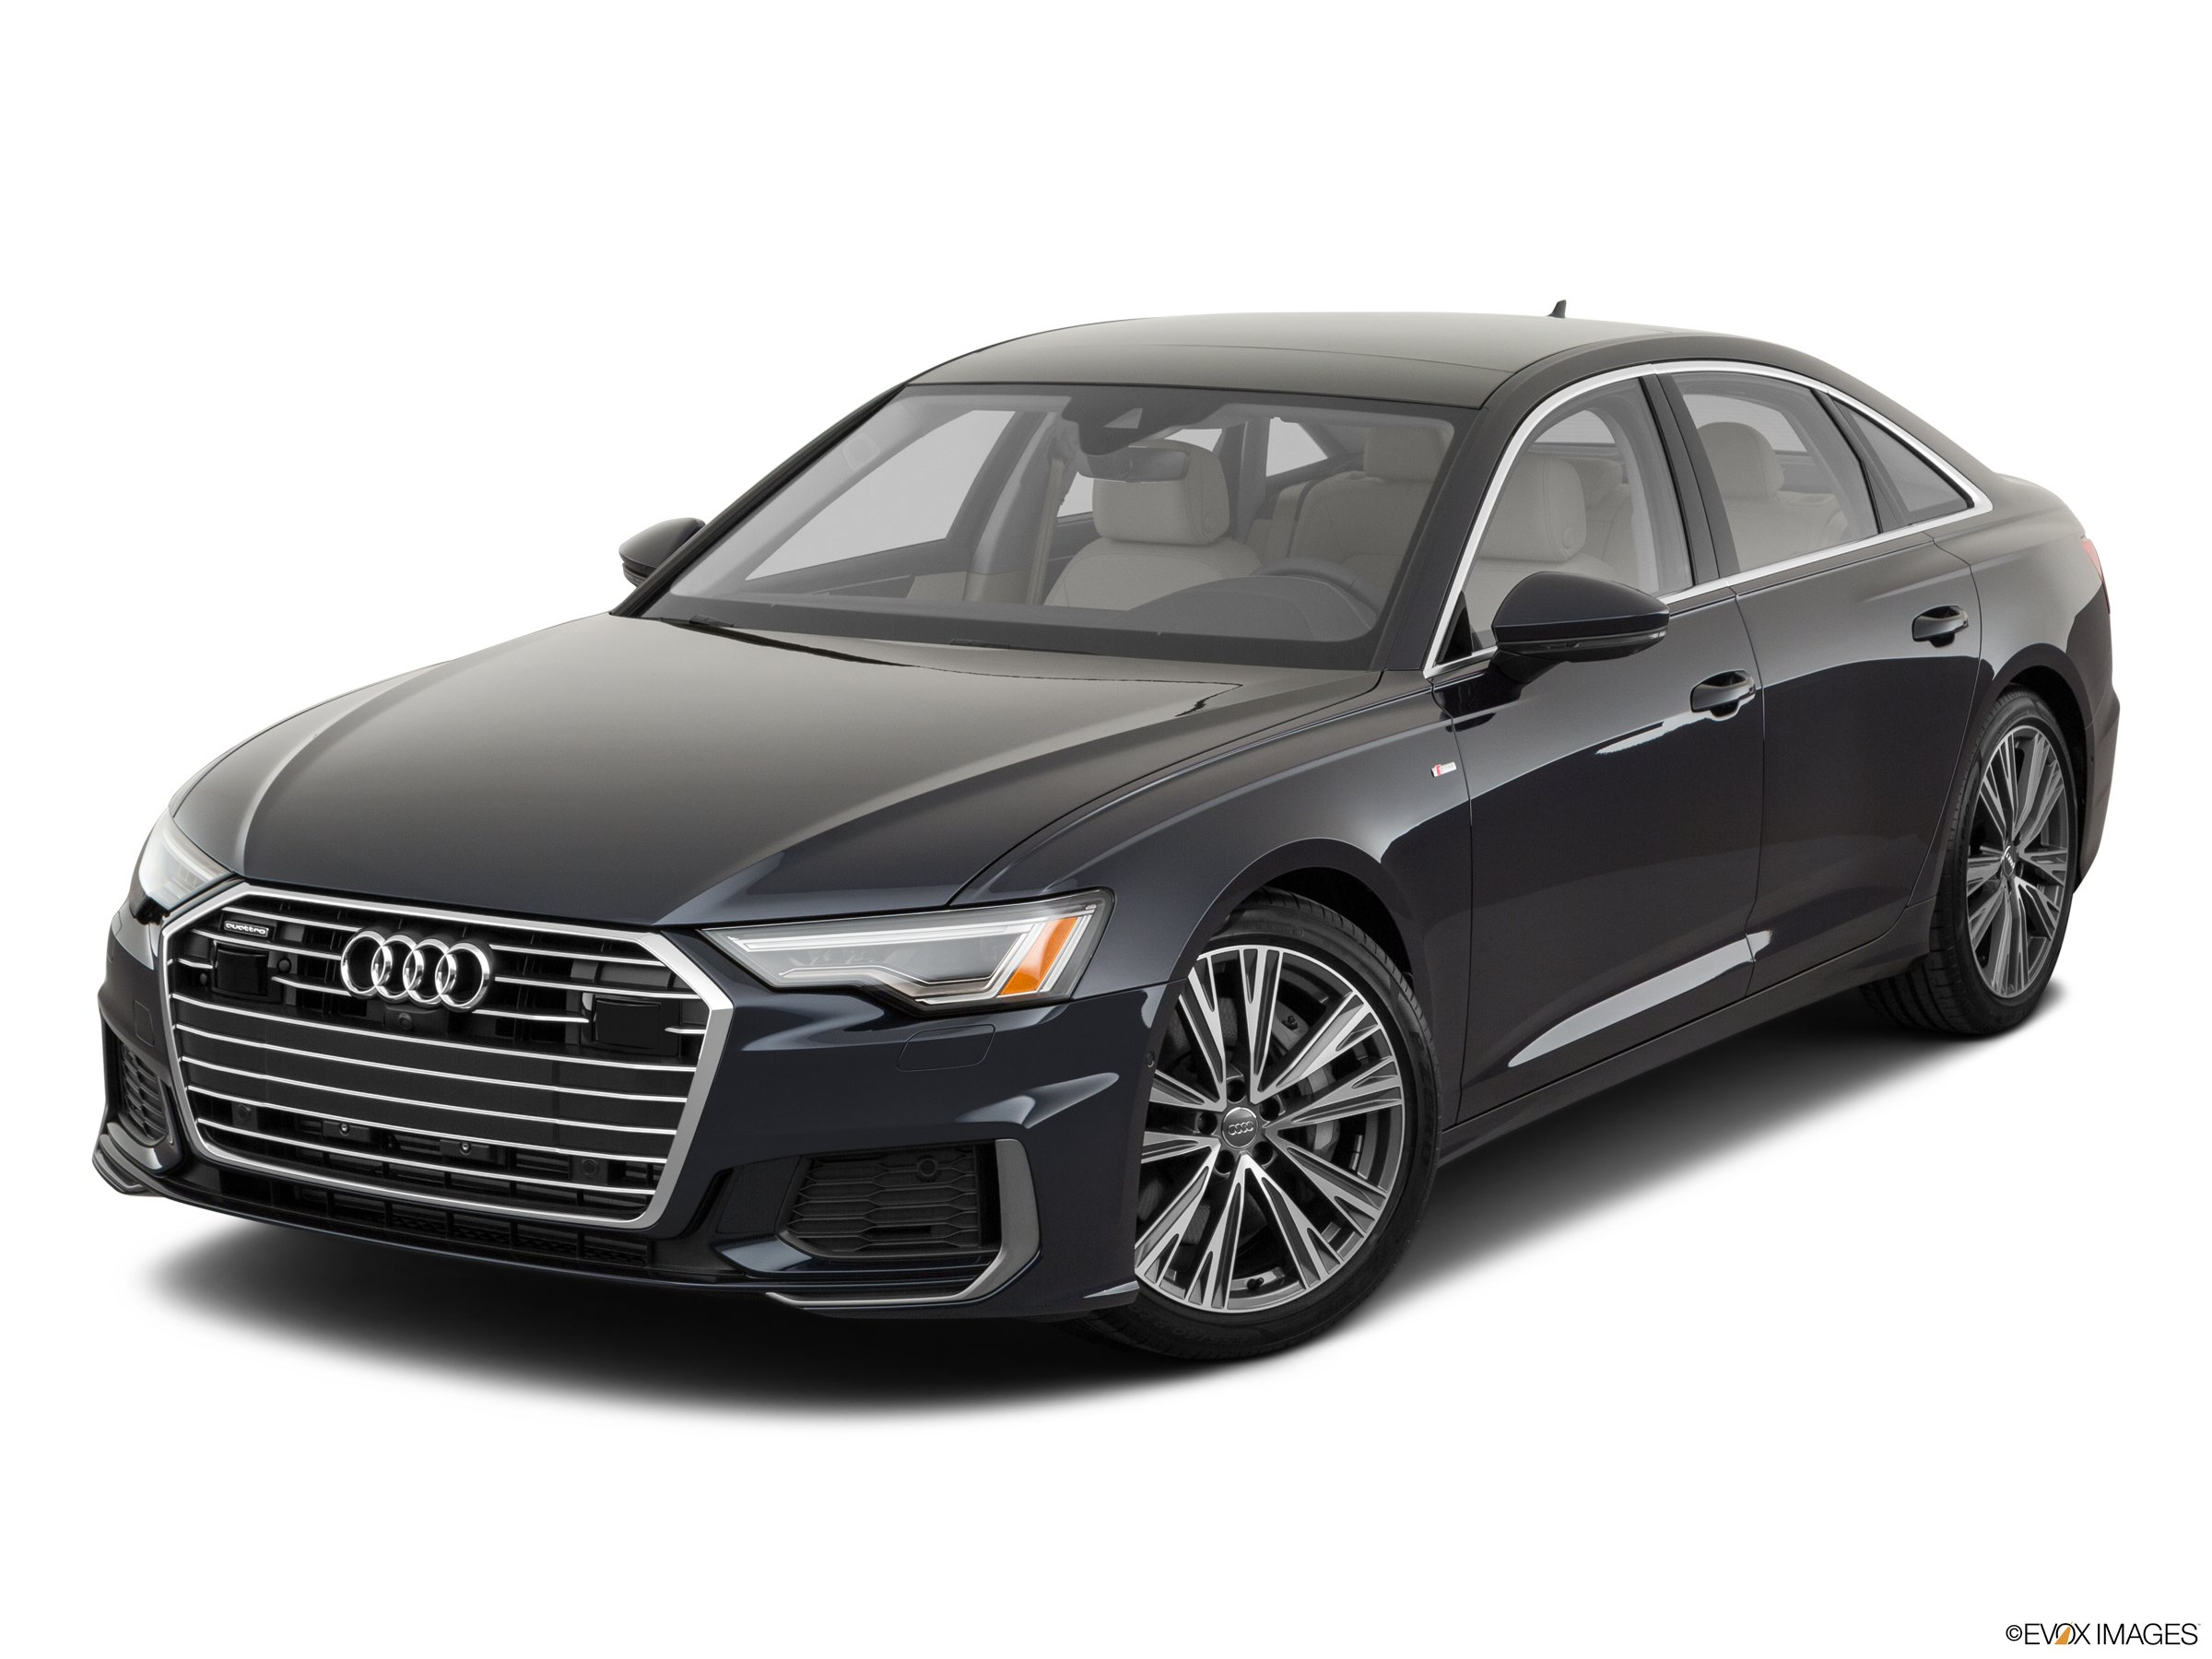 2020 Audi A6 Premium Plus 55 TFSI AWD sedan